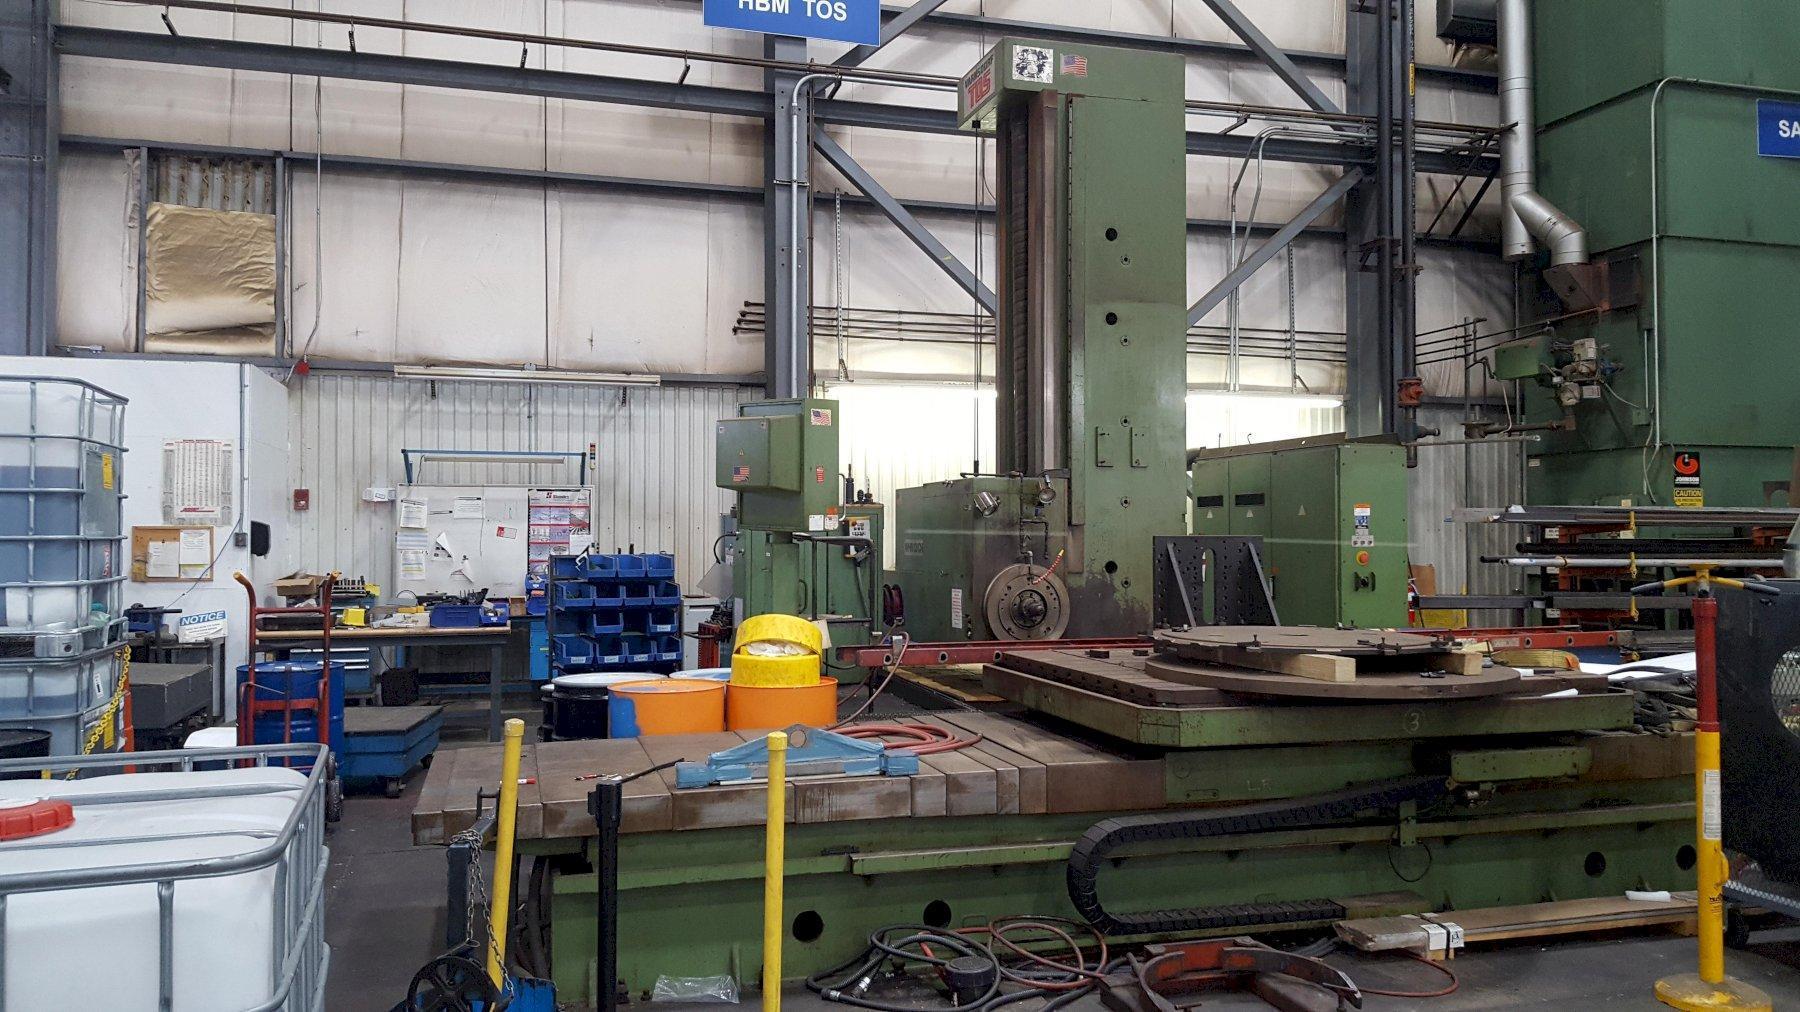 Tos WHN13 CNC Table Type Horizontal Boring Mill